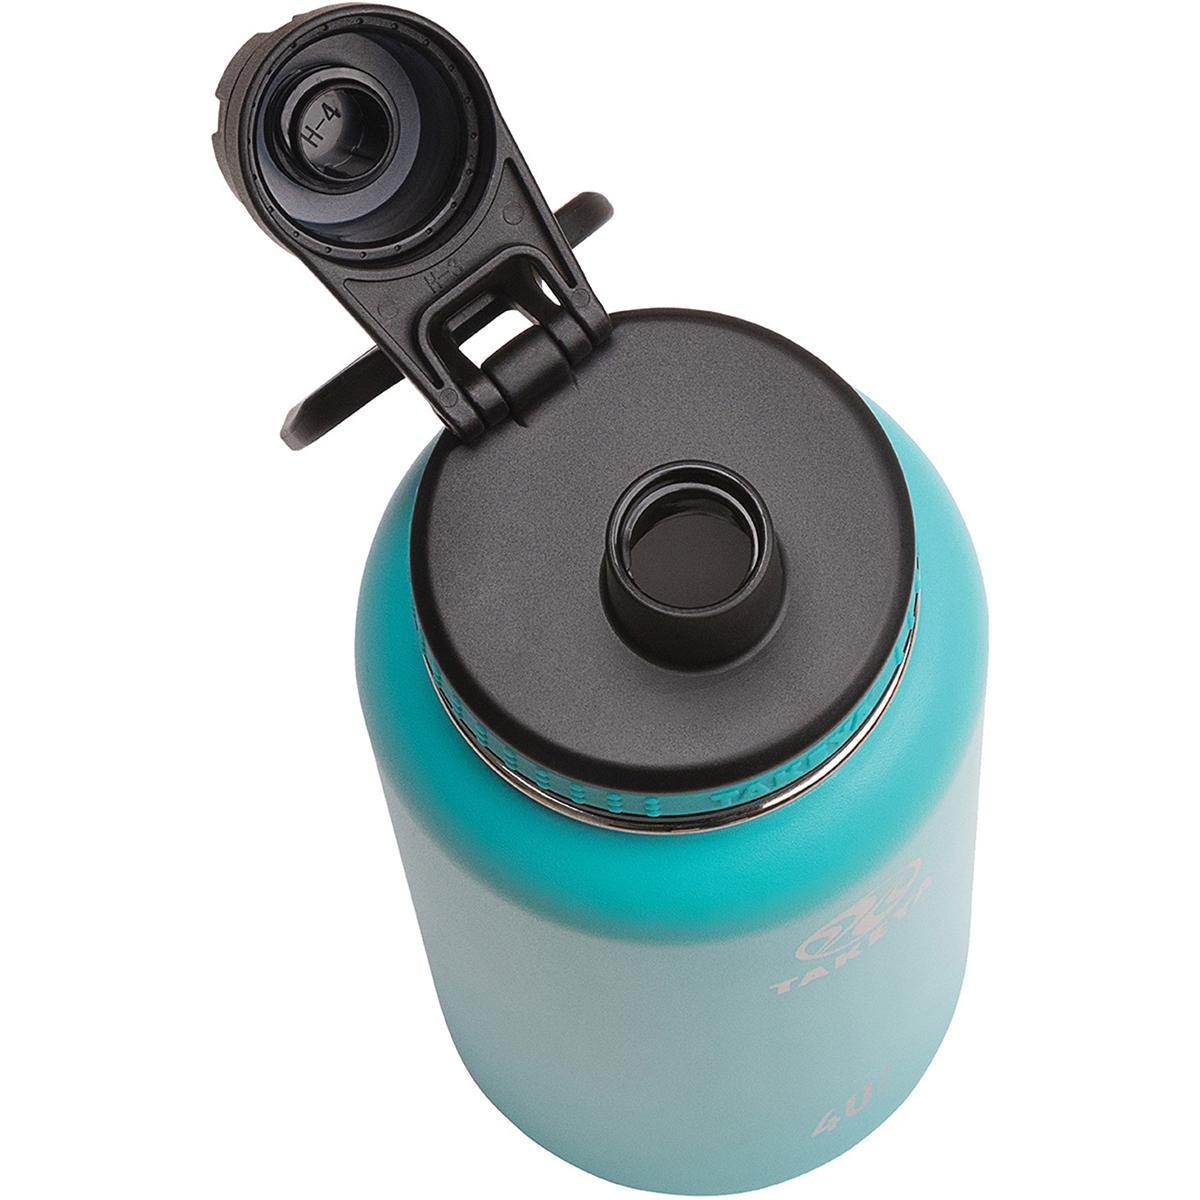 Takeya-Originals-40-oz-Insulated-Stainless-Steel-Water-Bottle thumbnail 12